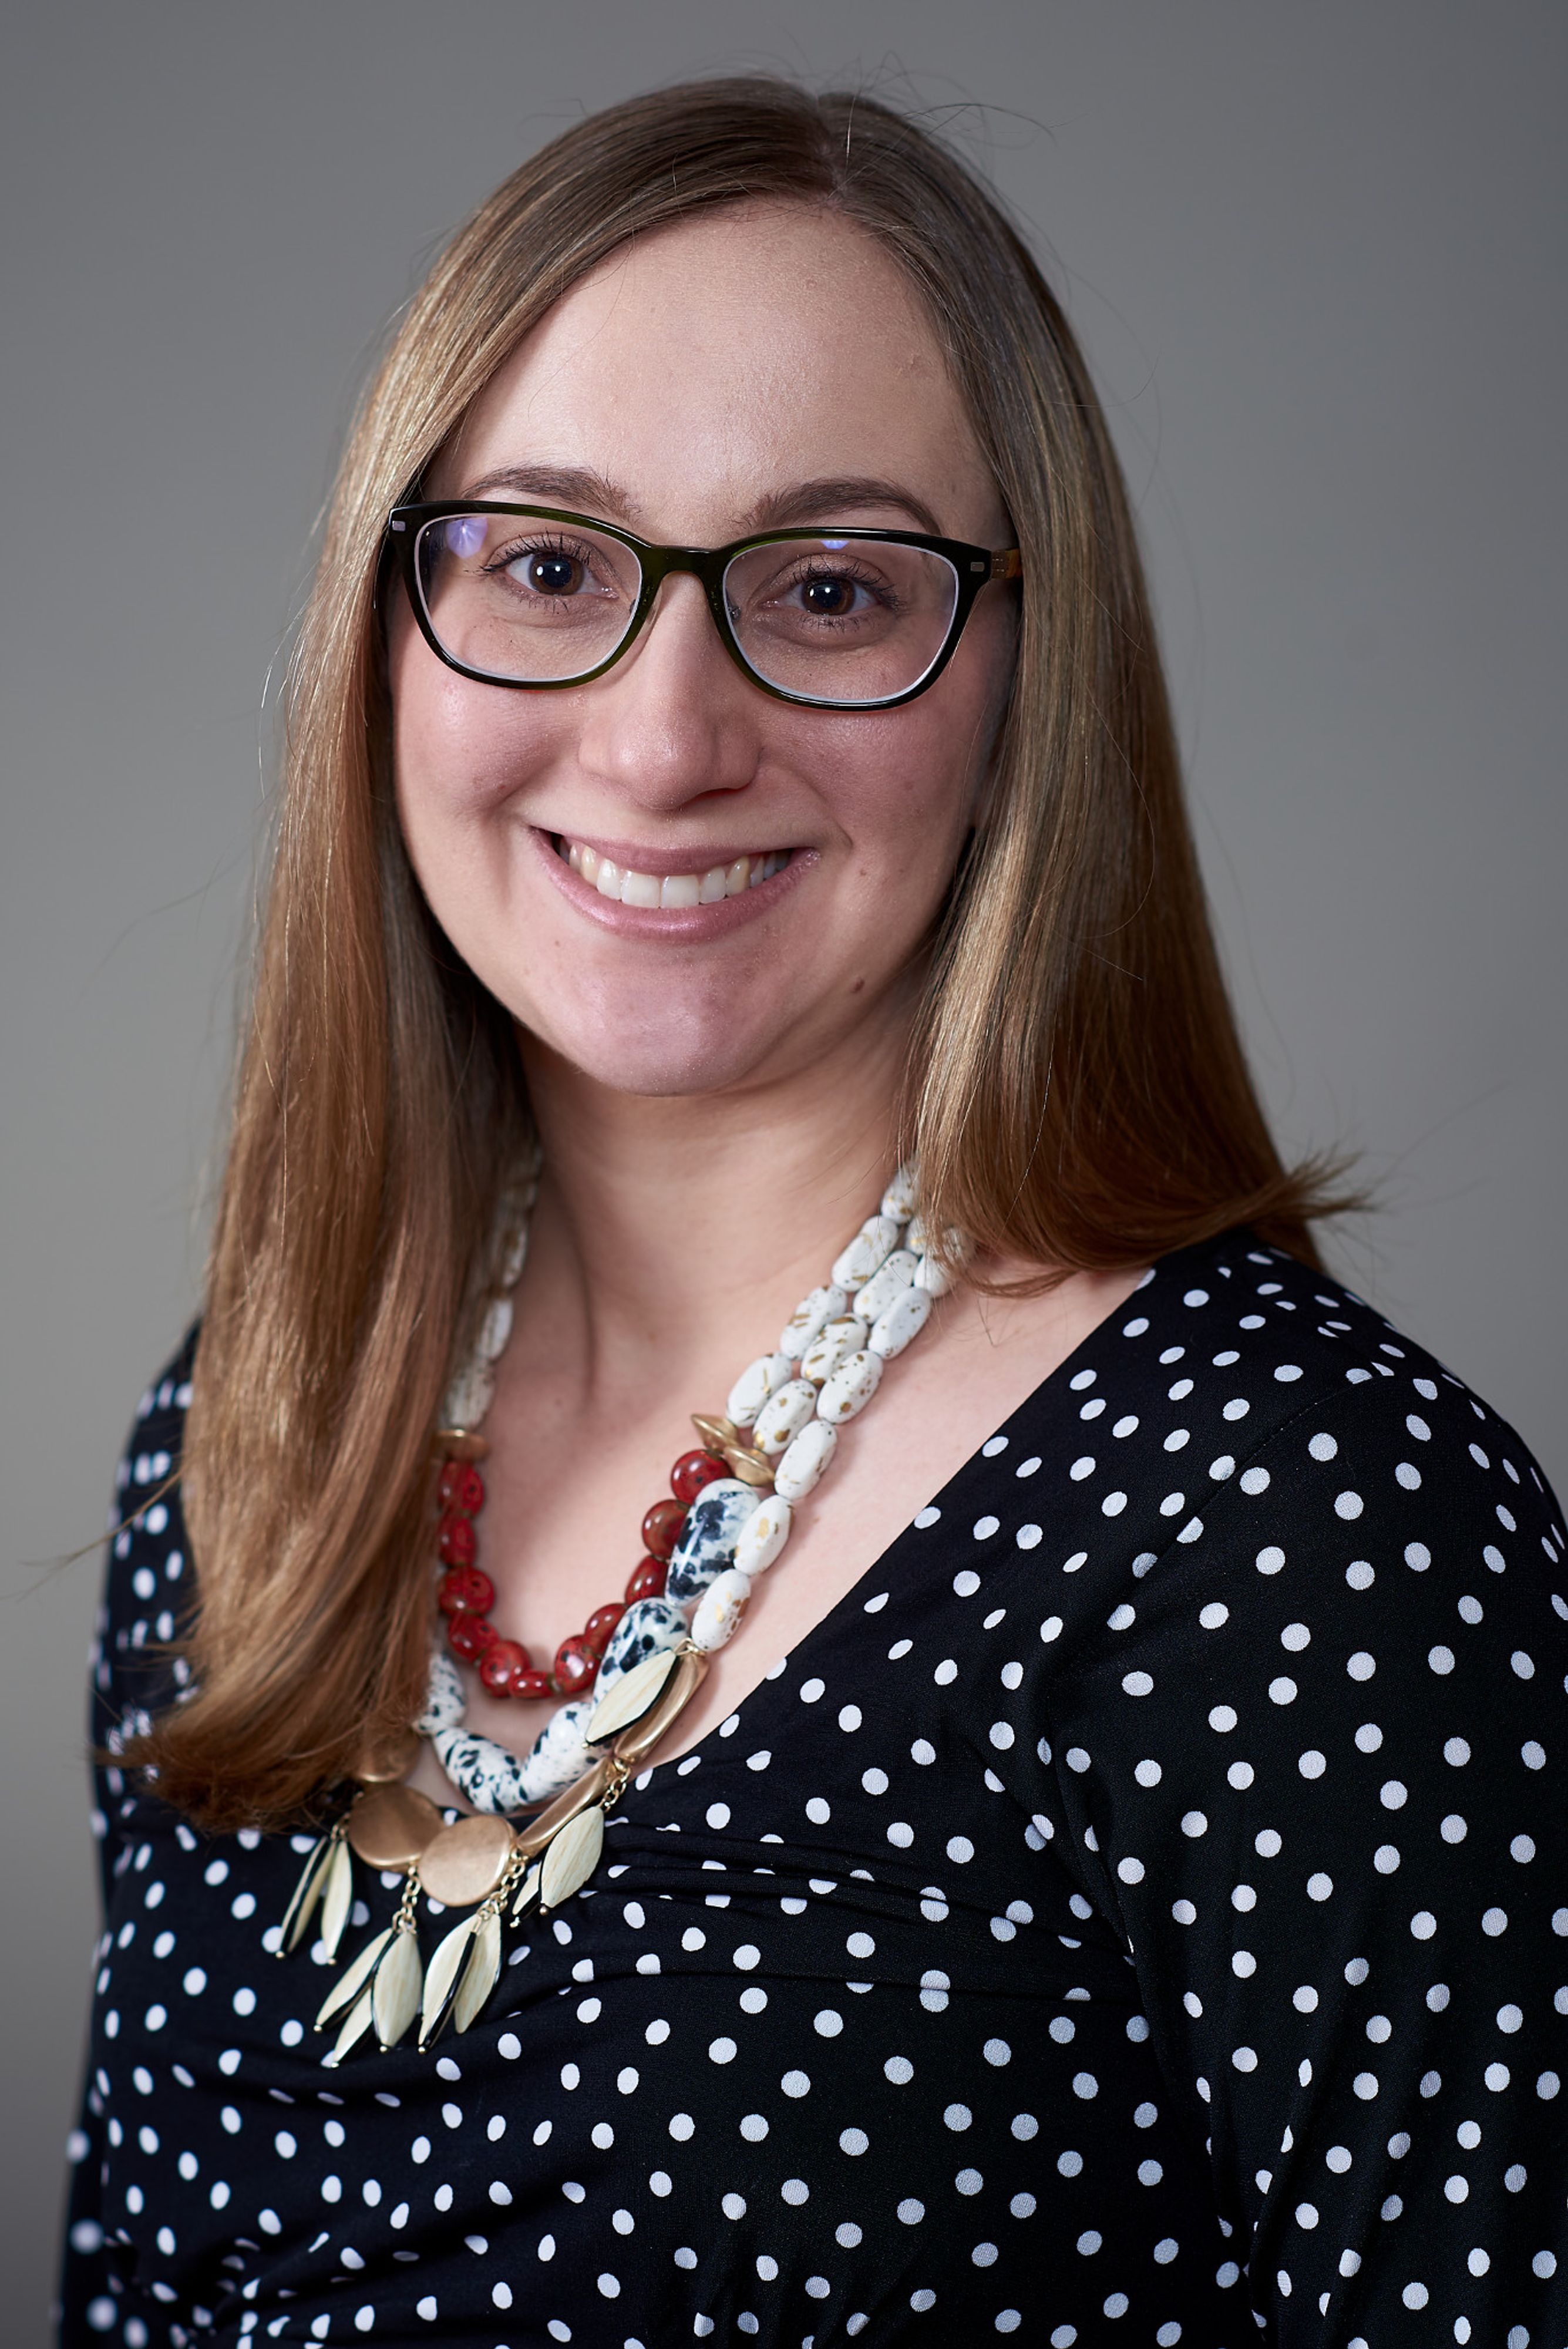 Laura Chirlin